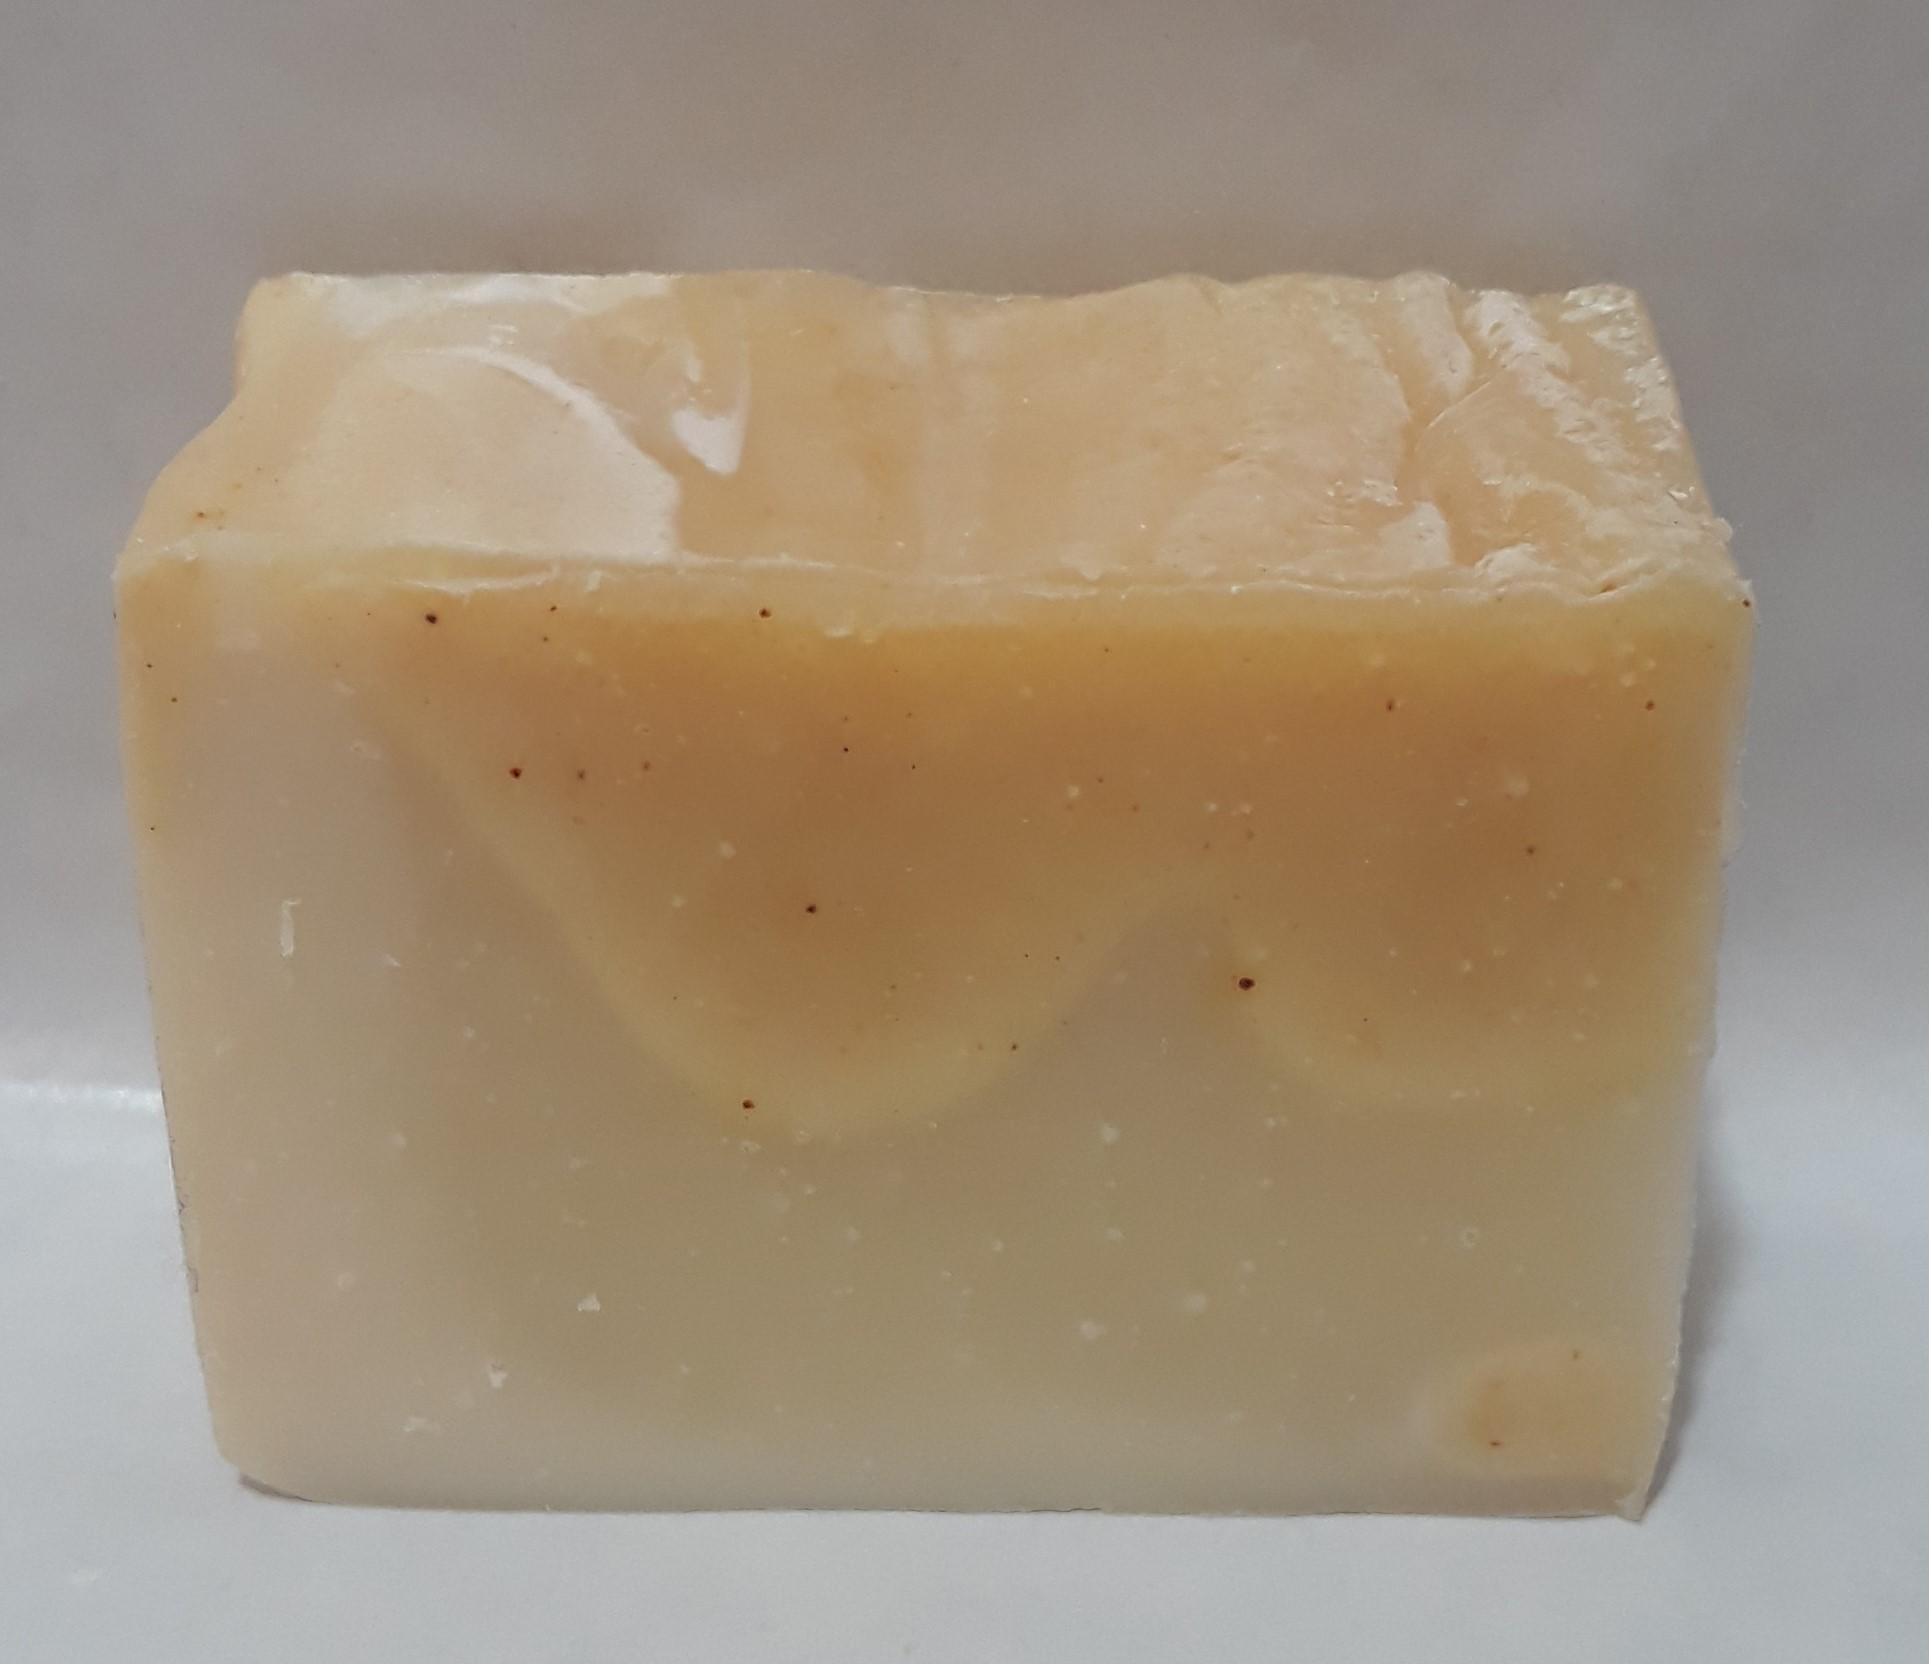 BHO soap